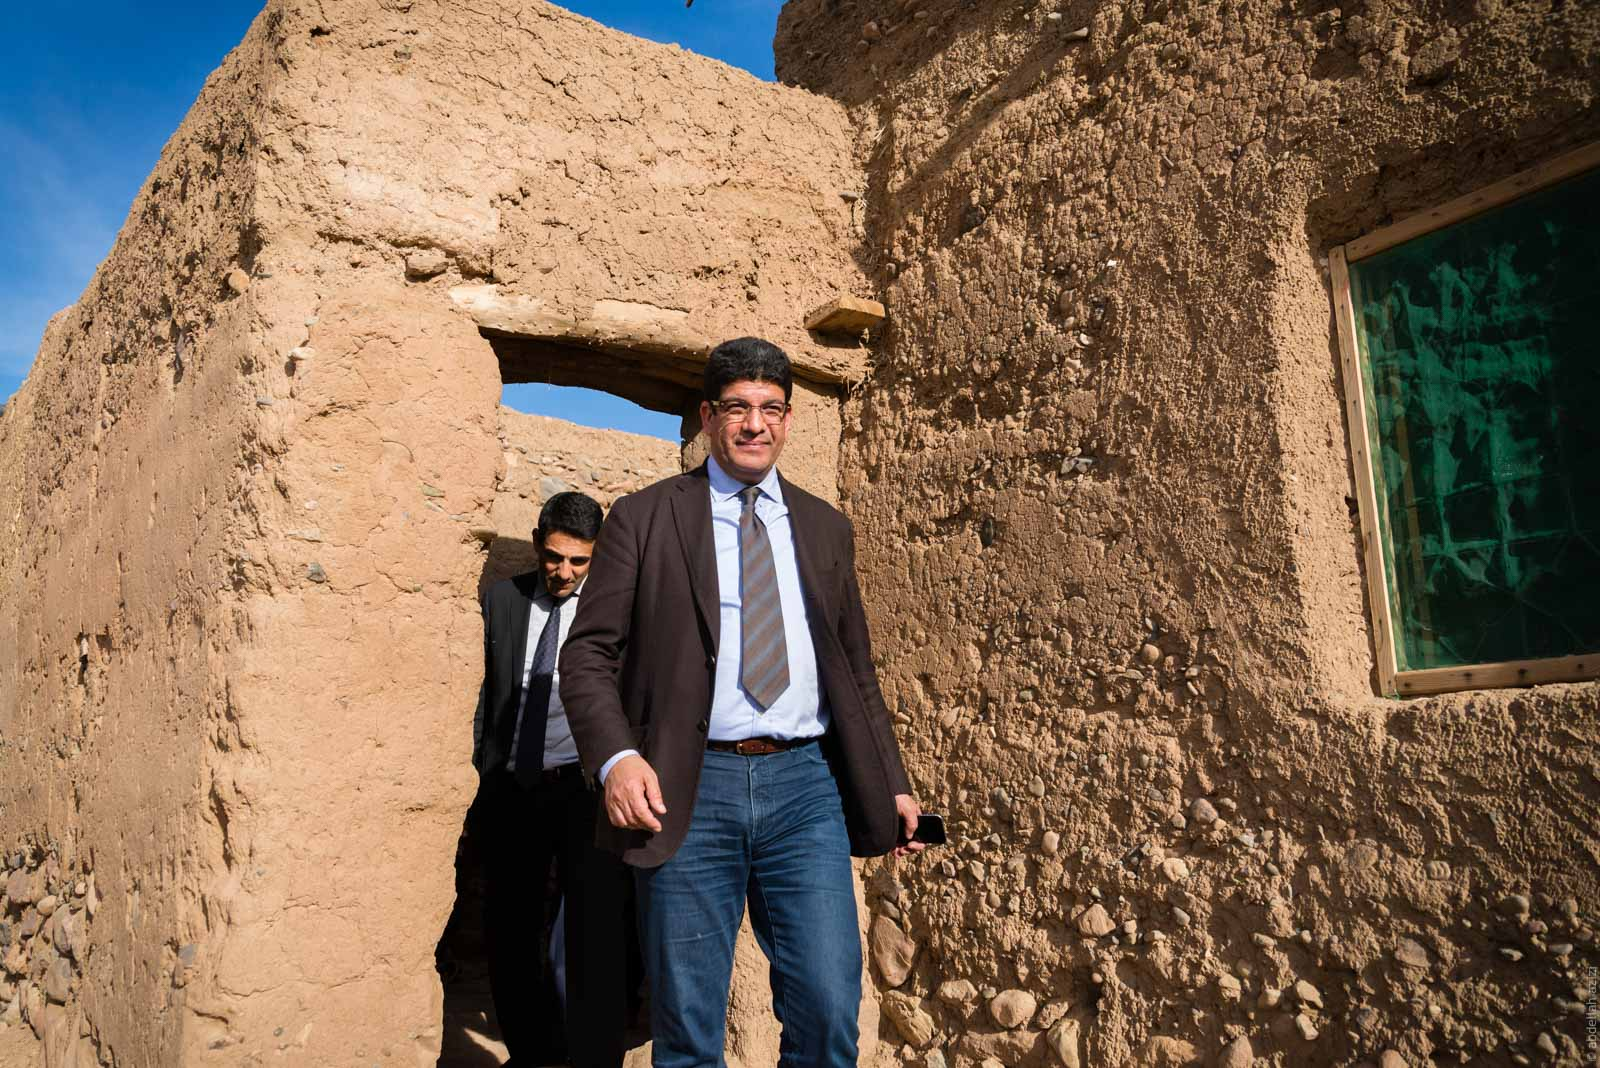 Mr. Mustapha Bakourry de Masen - Ouarzazate Solar Power Station Noor 1